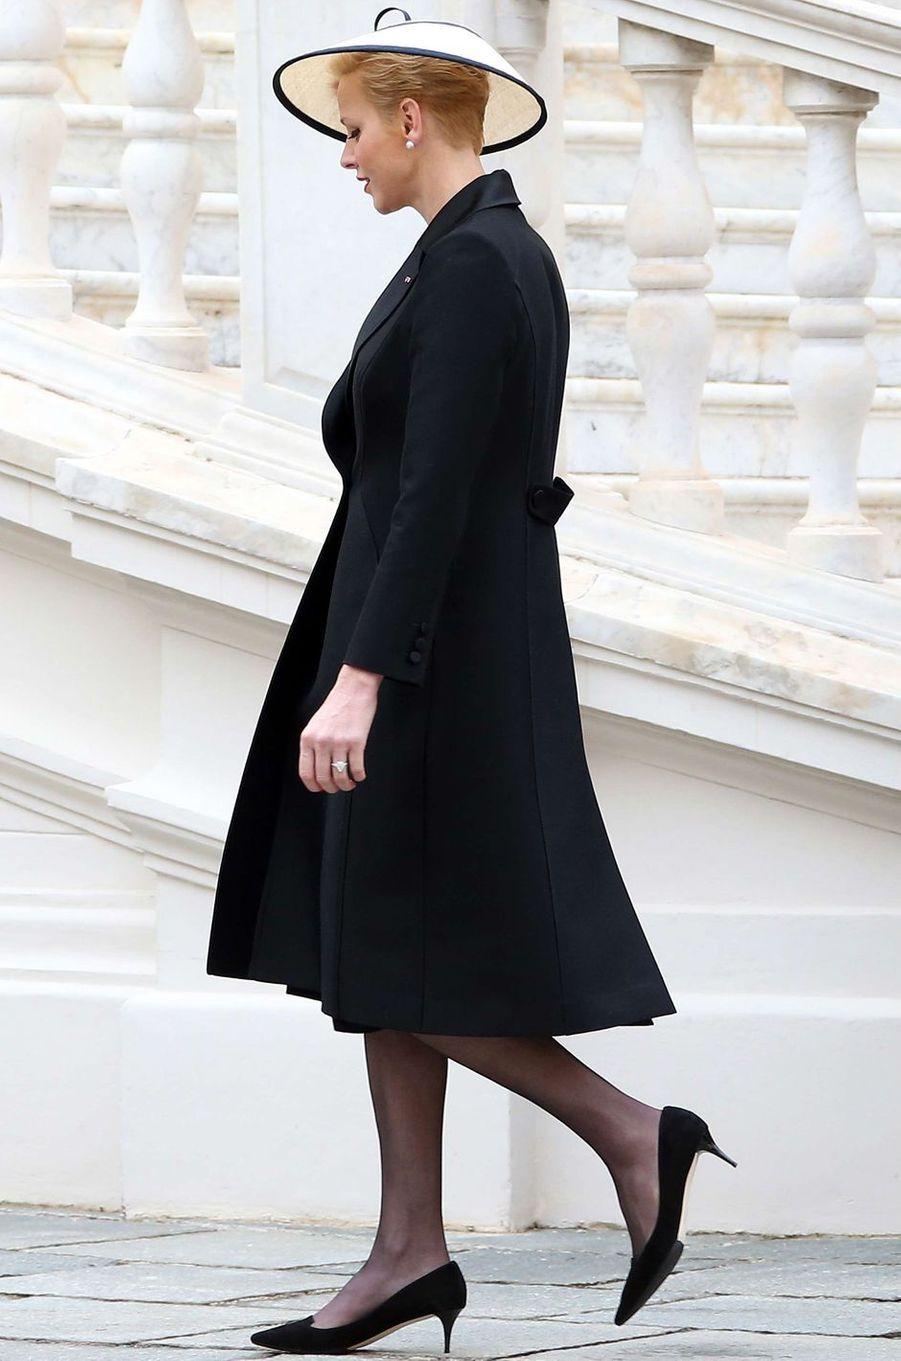 La princesse Charlène de Monaco, le 19 novembre 2016